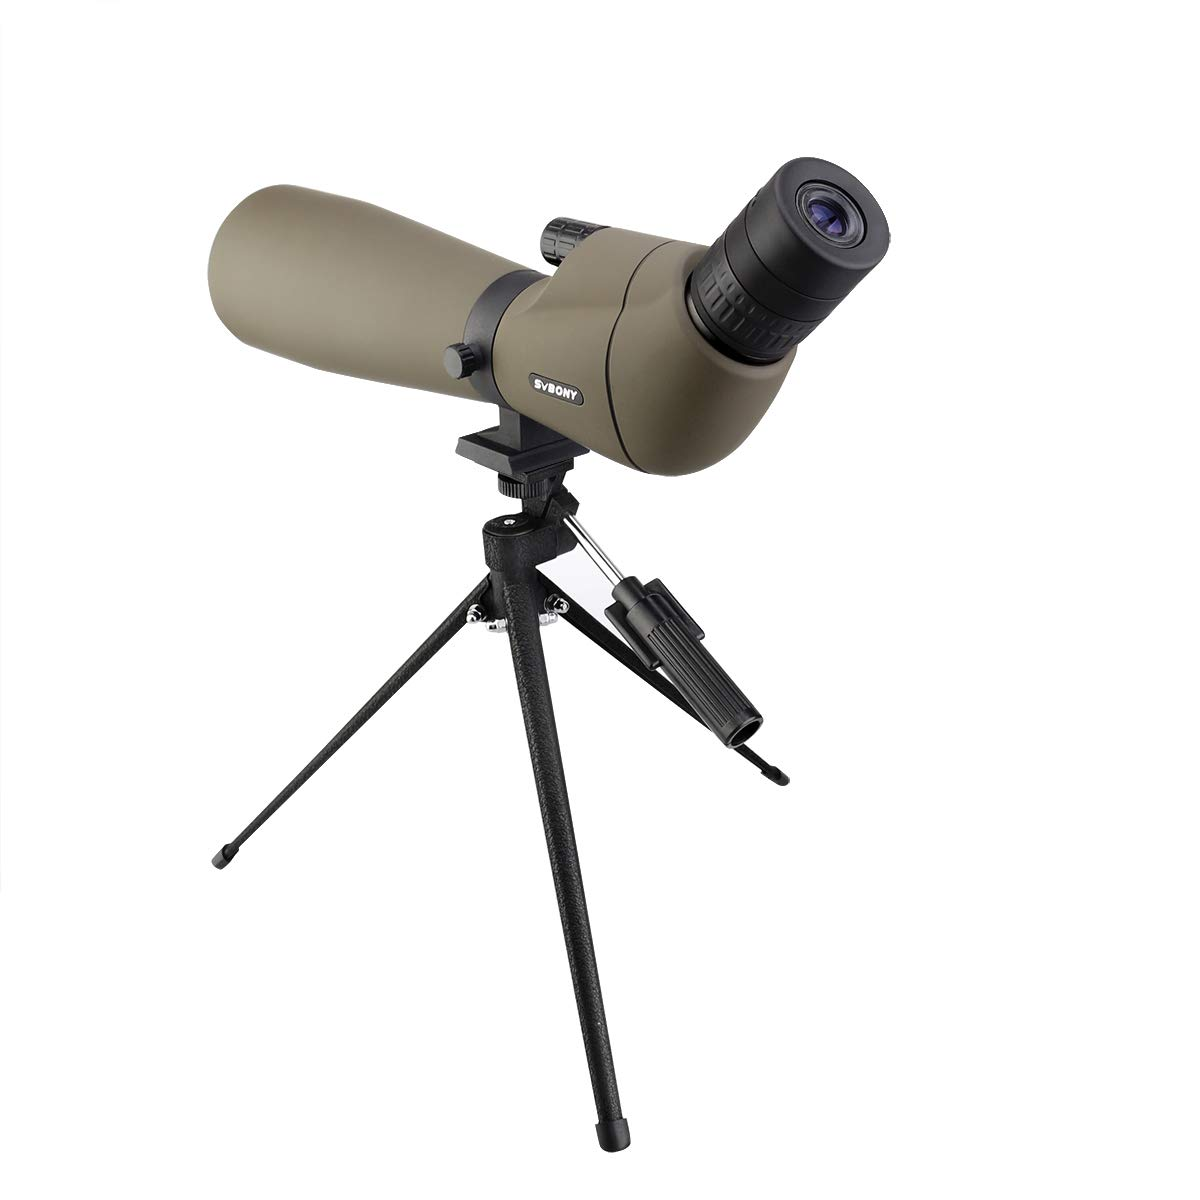 Svbony SV401 Telescopio Terrestre 20-60x80 Potente HD FMC Porro Prisma Catalejo Ocular Angulado Impermeable Telescopio Terrestre con Tr/ípode Grande para Observaci/ón de Aves Tiro al Arco